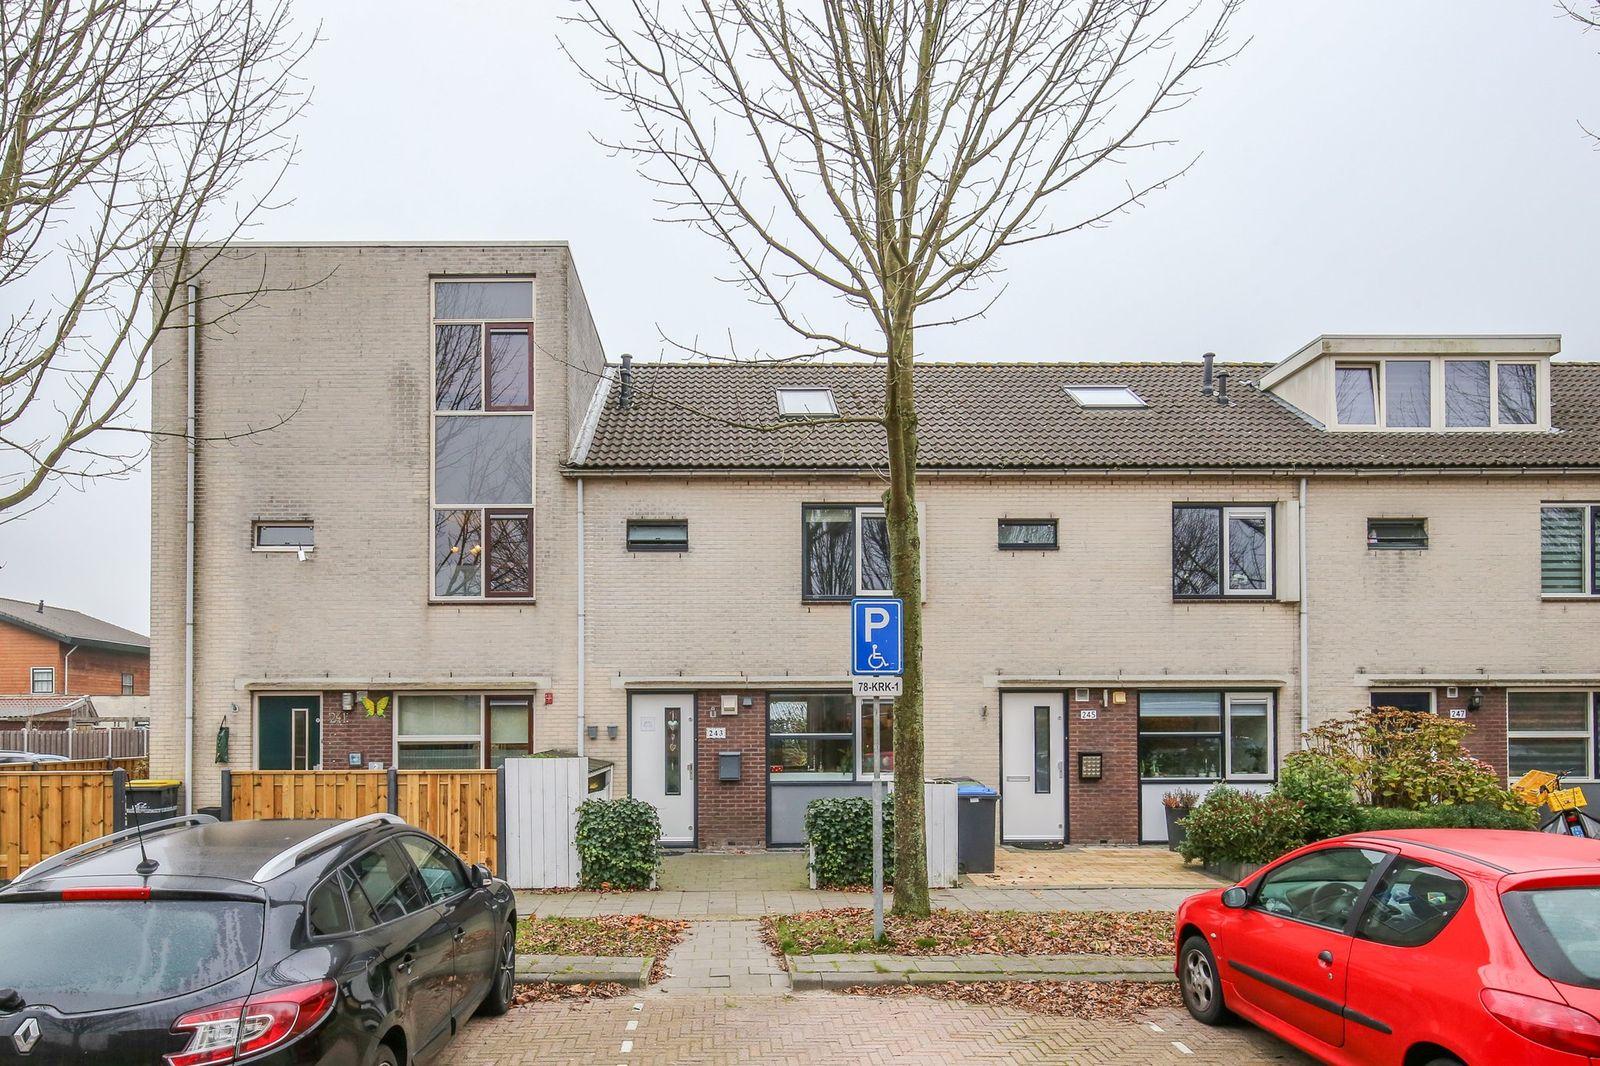 Rijnland 243, Lelystad